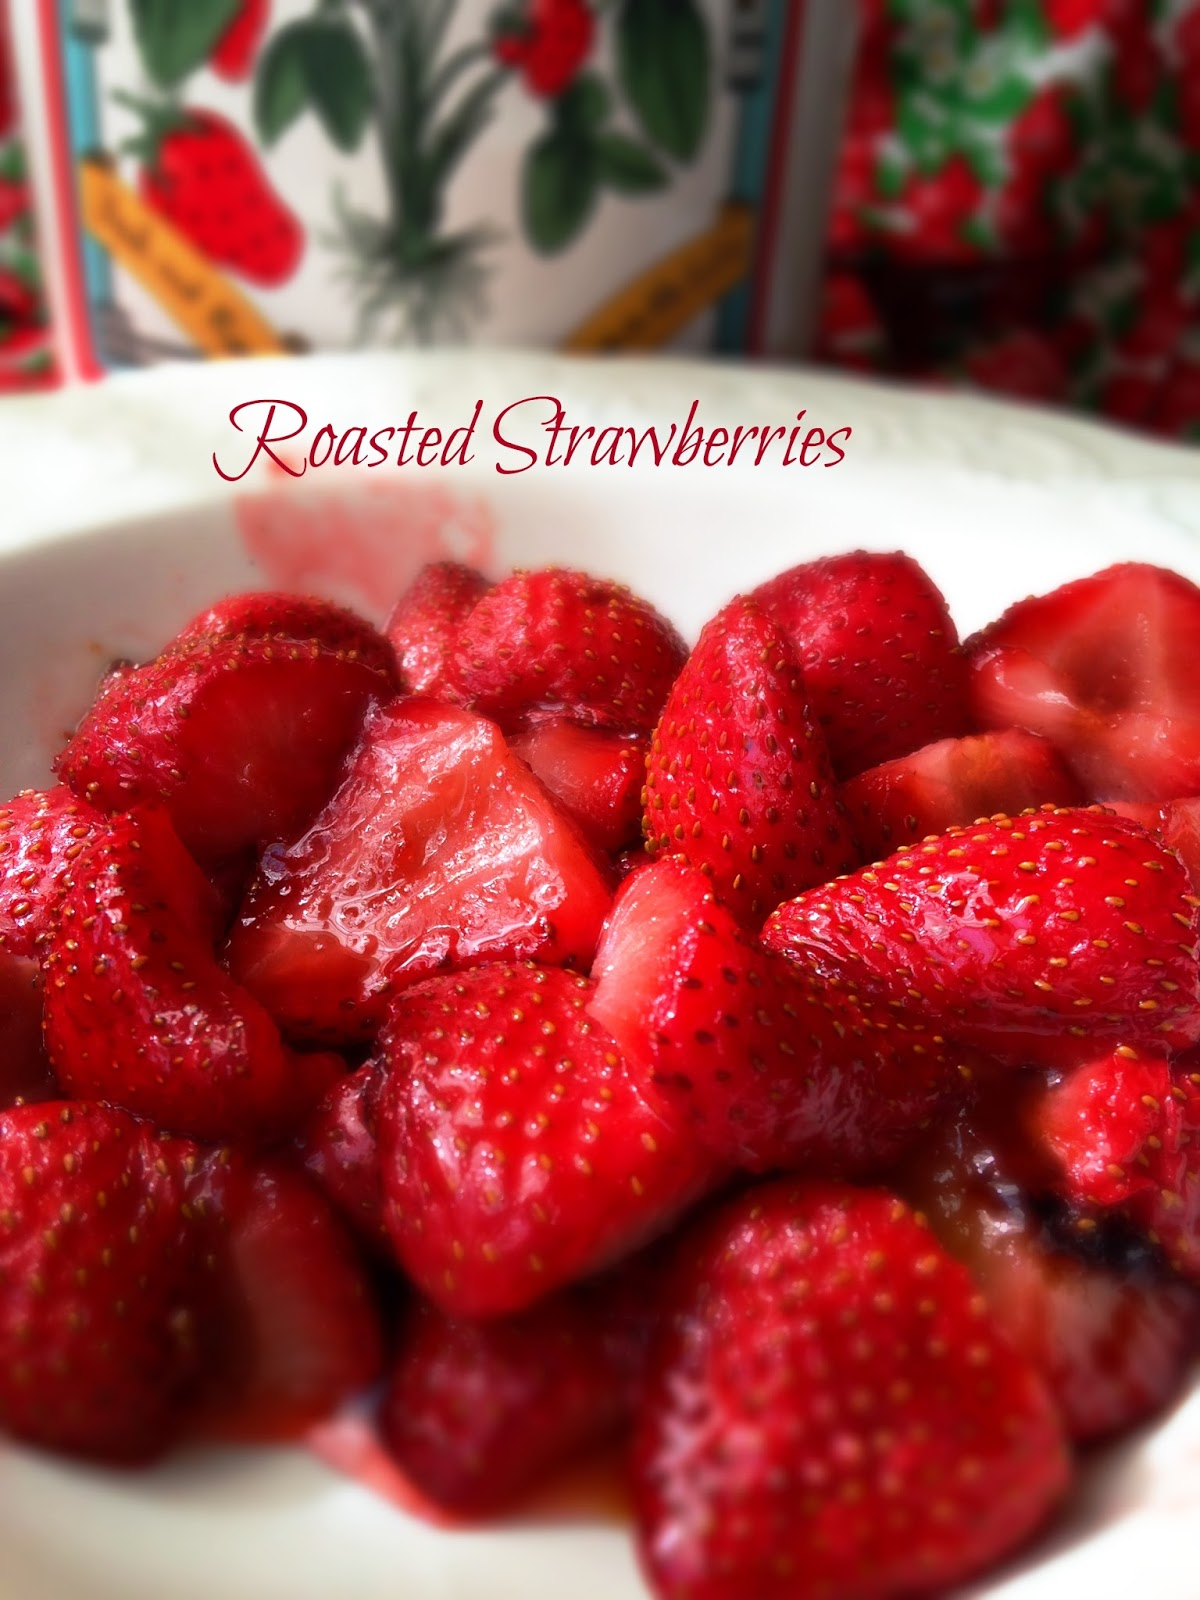 Turnips 2 Tangerines: Roasted Strawberries